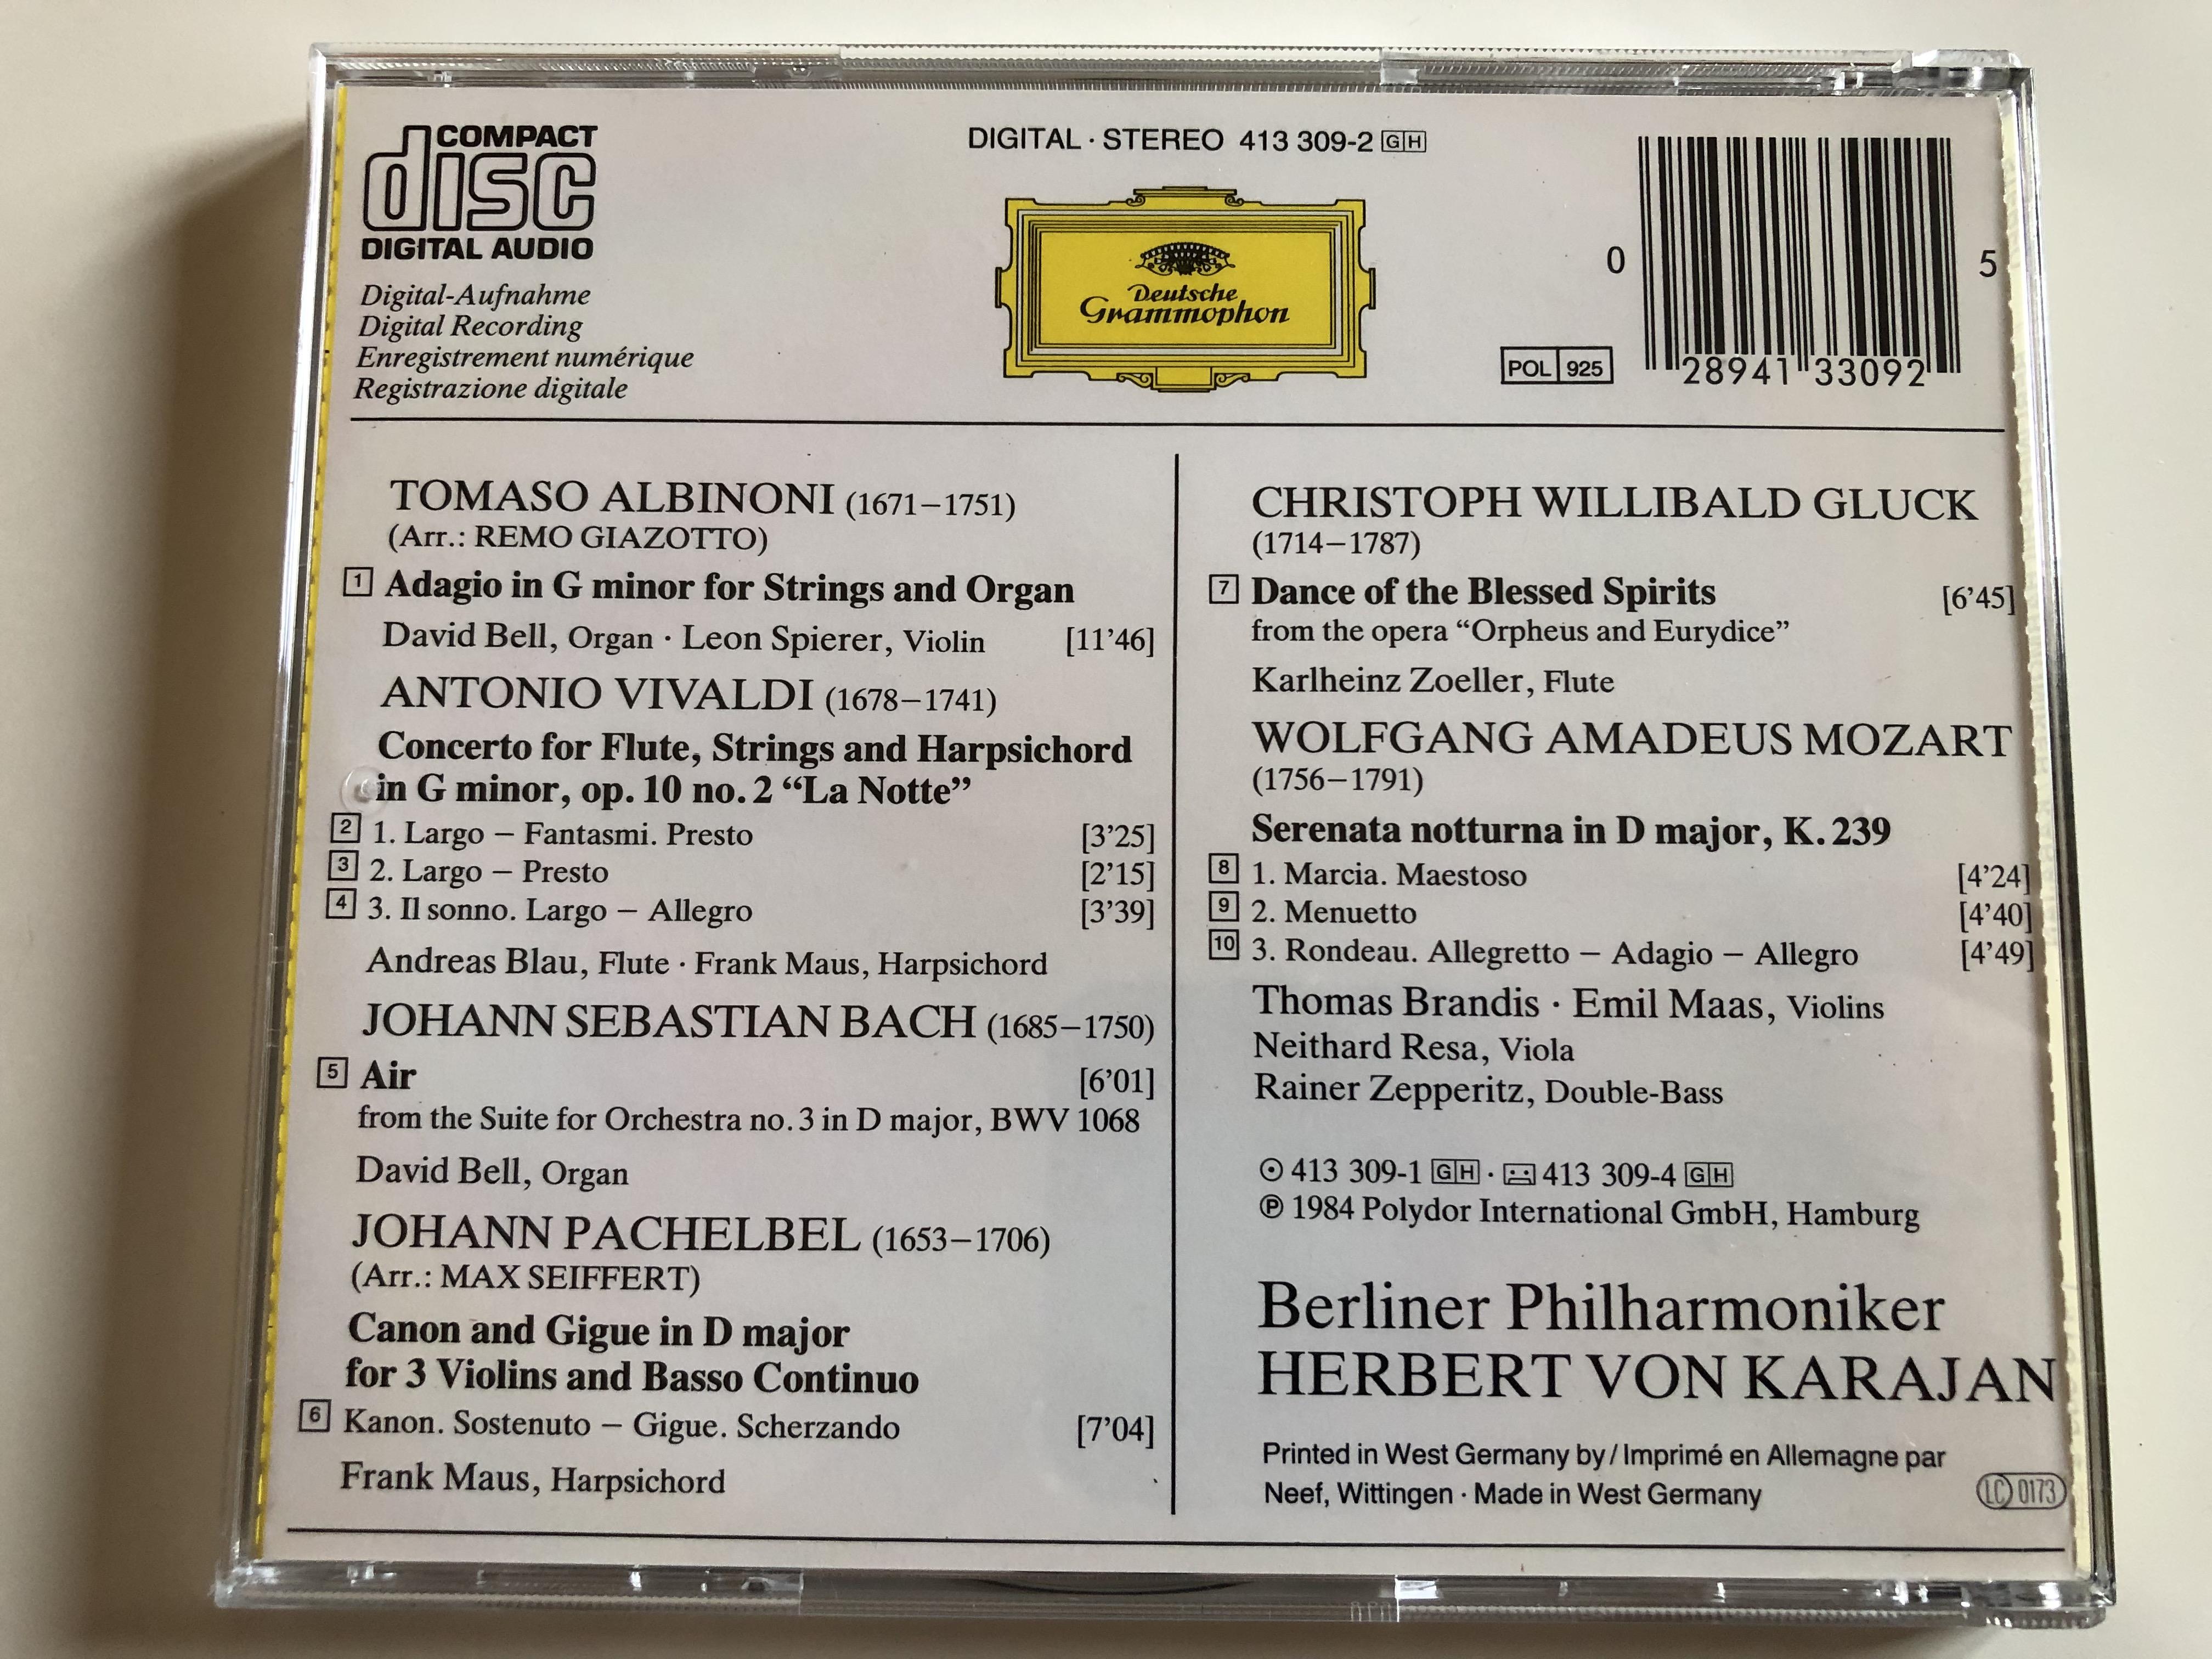 albinoni-adagio-pachelbel-canon-bach-air-vivaldi-la-notte-mozart-serenata-nottuma-gluck-reigen-seliger-geister-dance-of-the-blessed-spirits-berliner-philharmoniker-herbert-von-karajan-7-.jpg